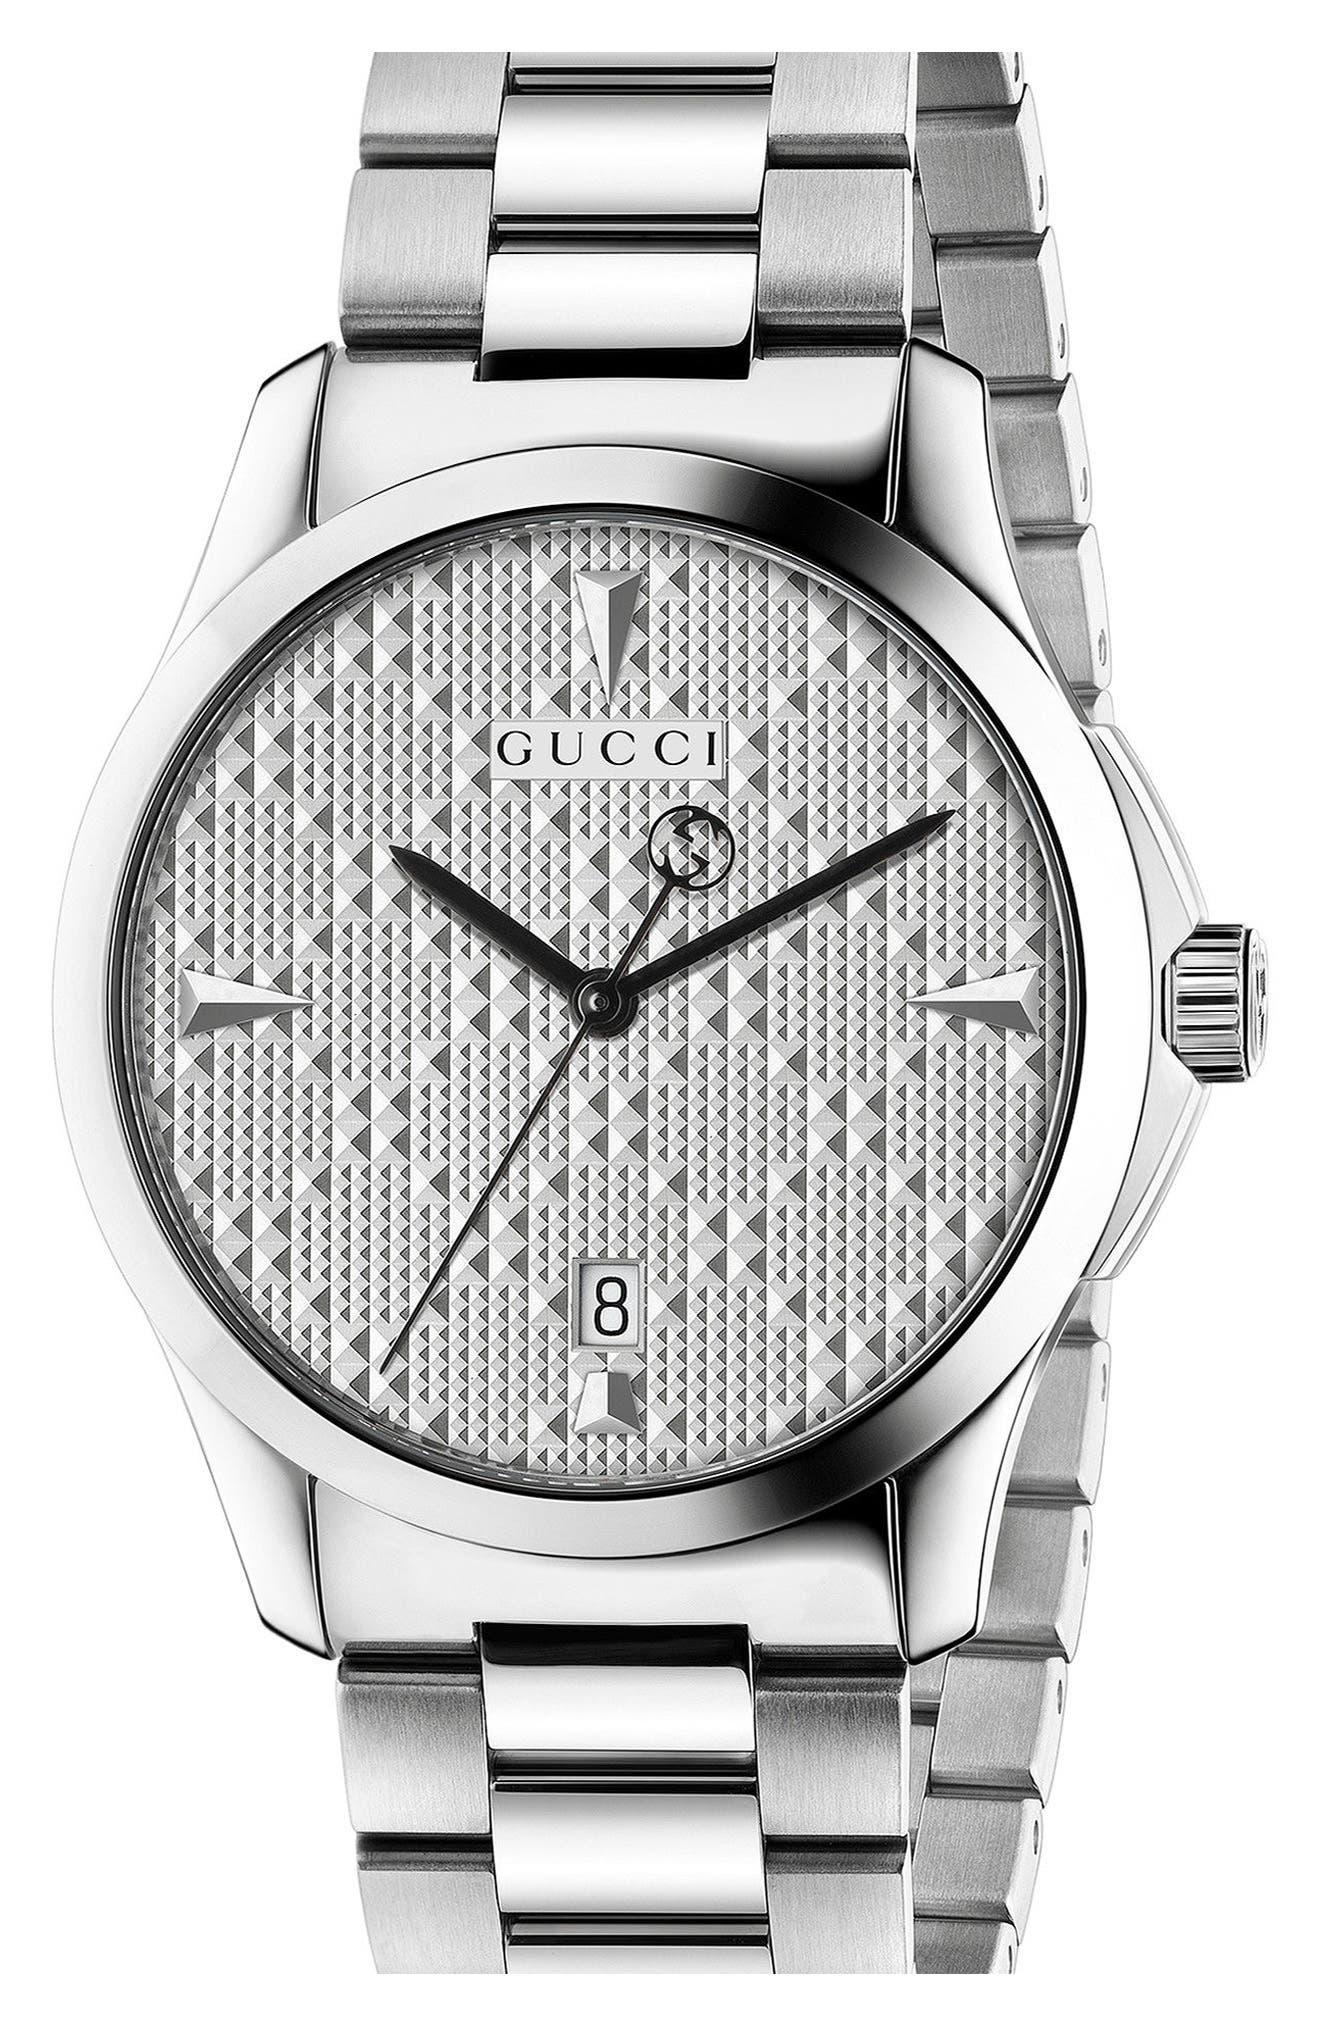 Main Image - Gucci G-Timeless Bracelet Watch, 38mm